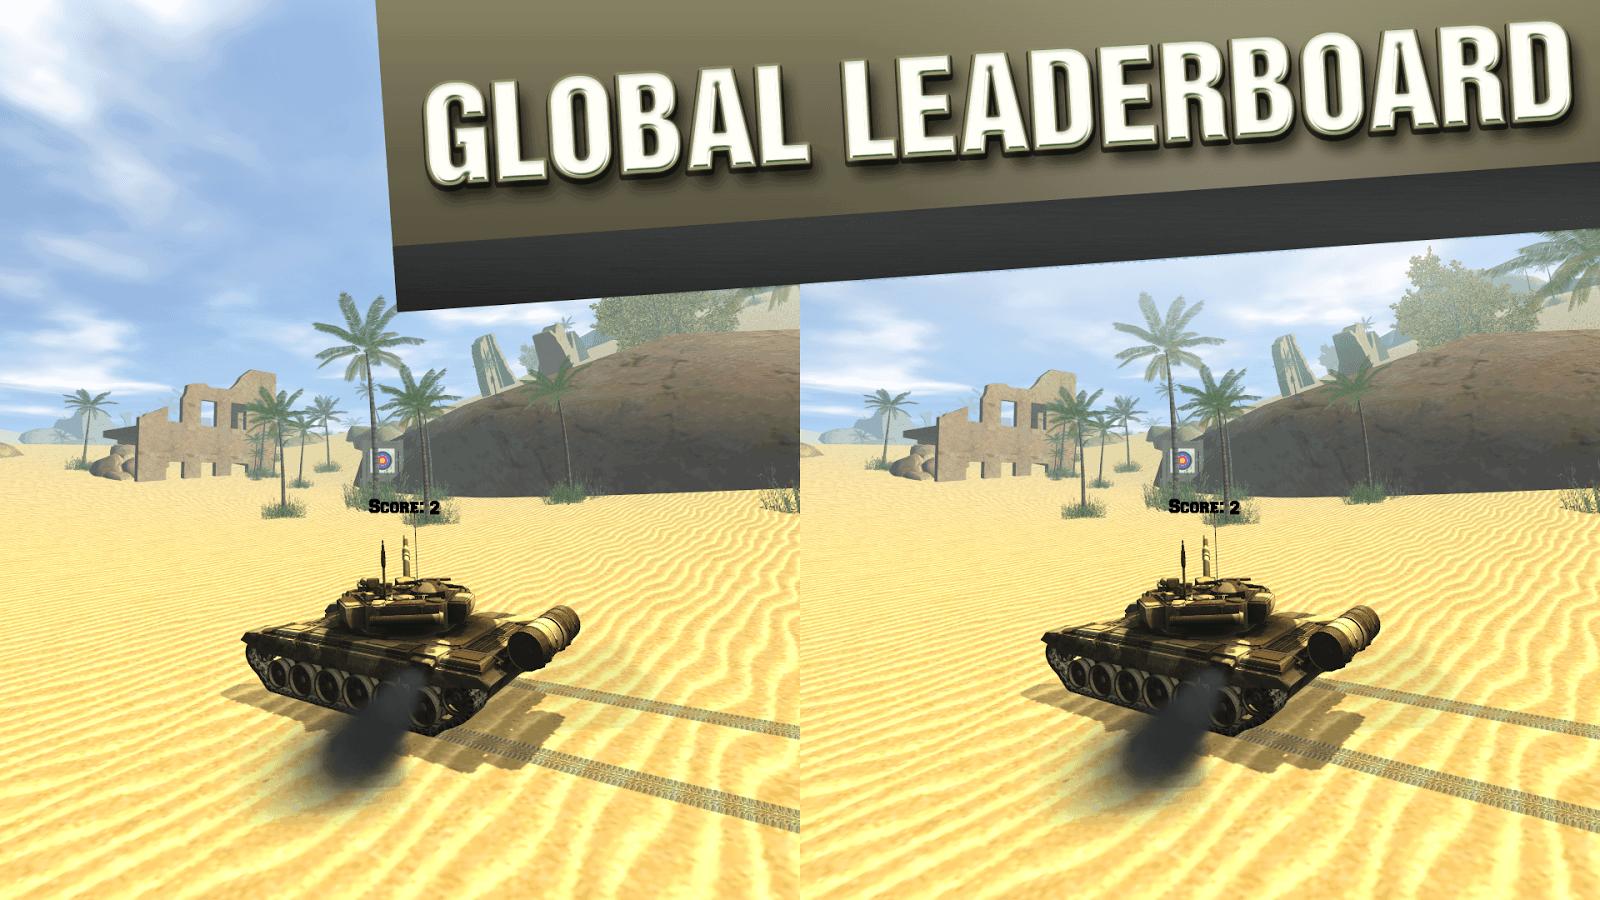 VR Tank Training for Cardboard